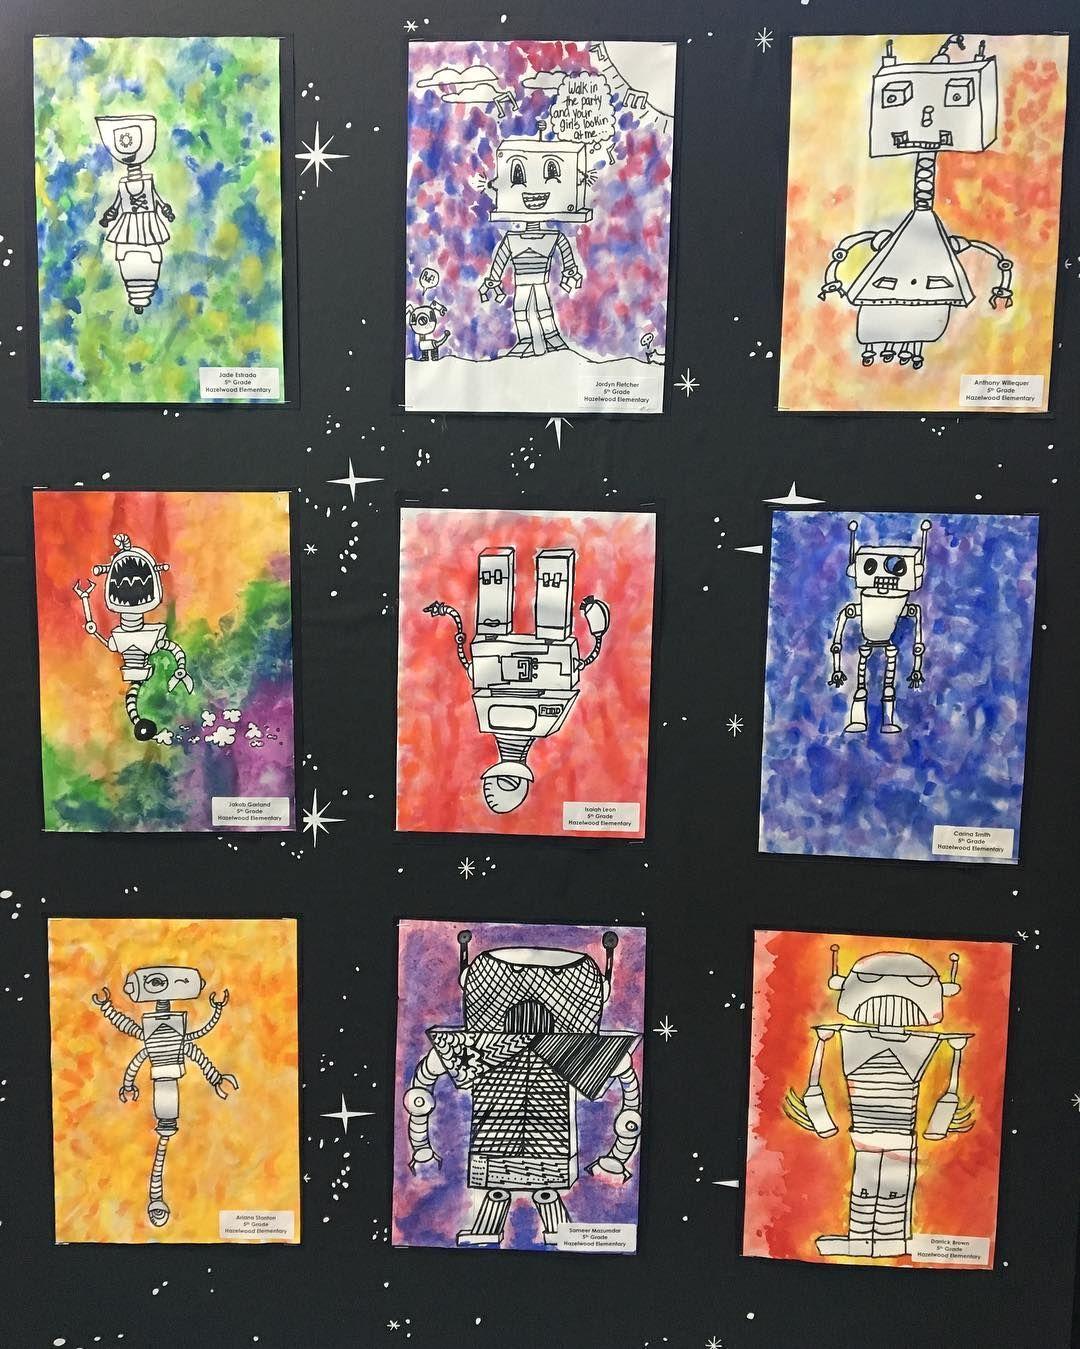 5th Grade 3d Shapes Forms Art Lesson Project Idea